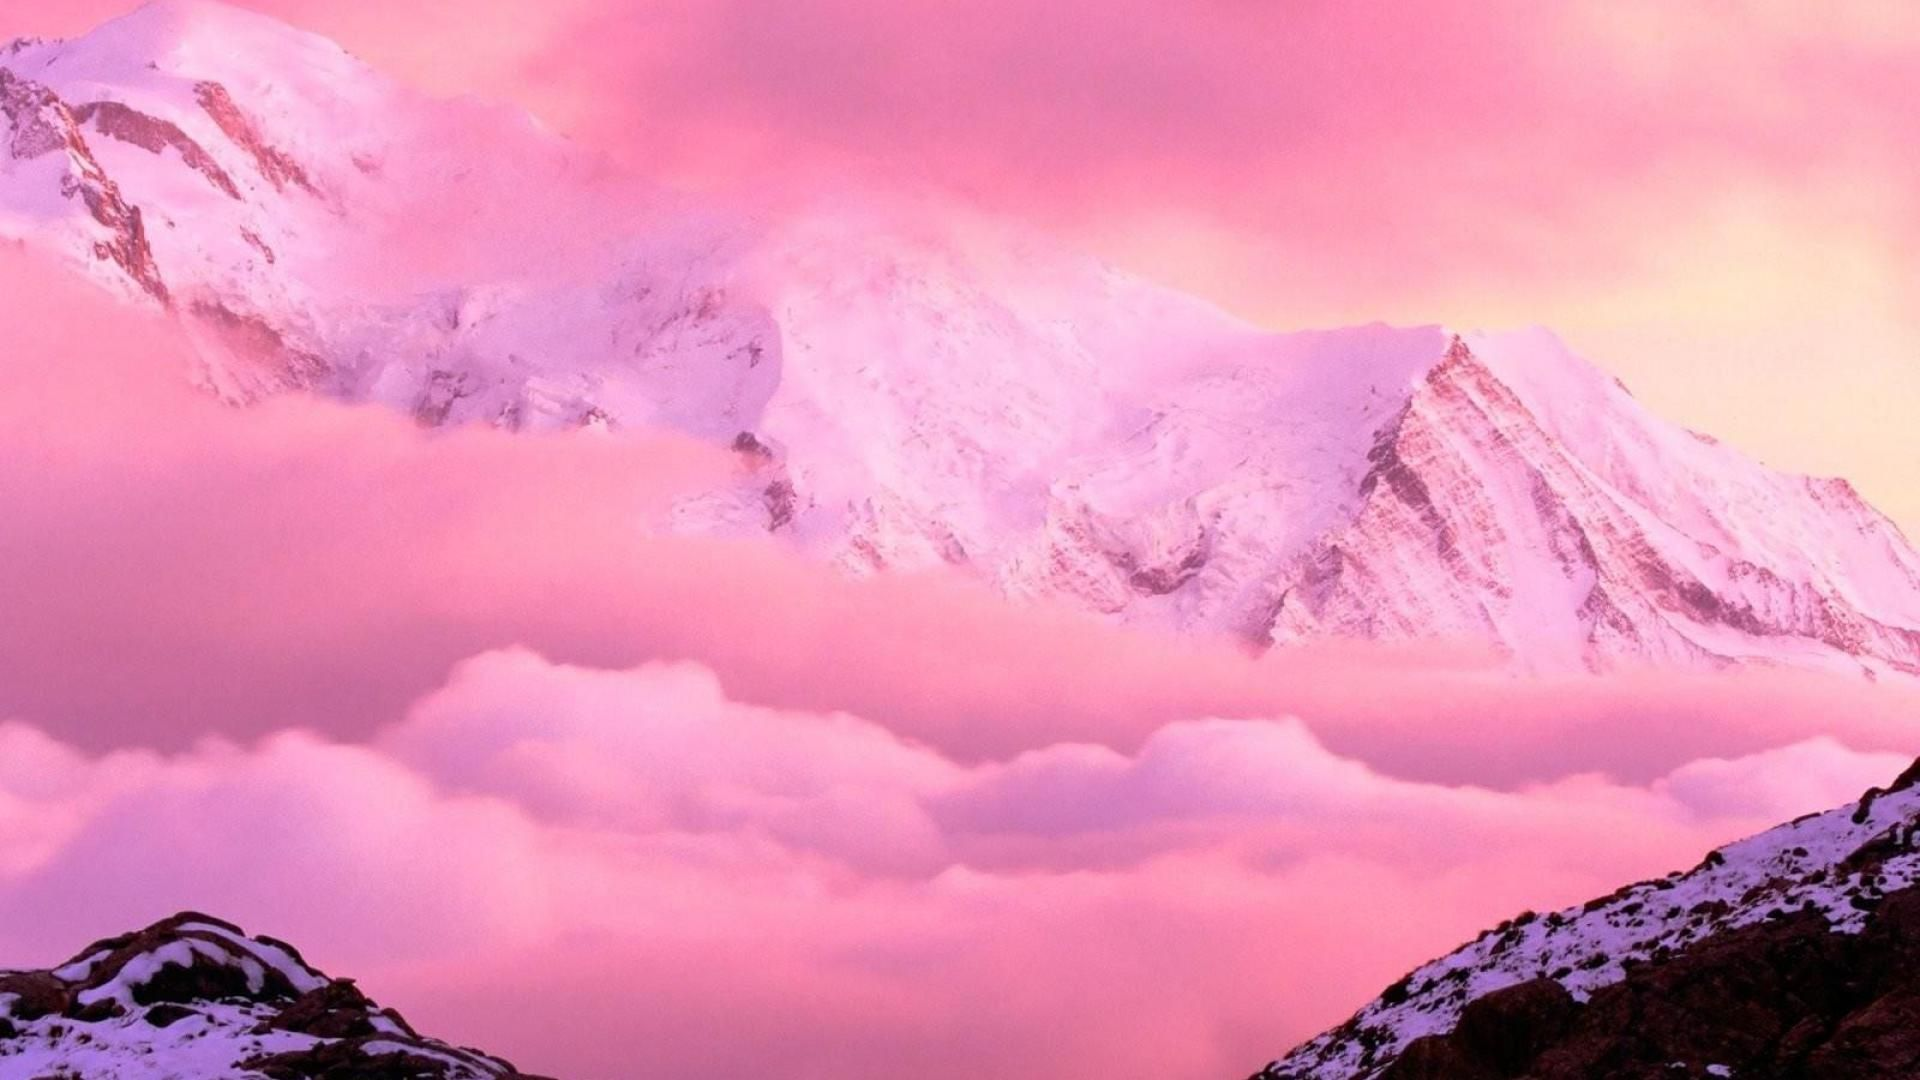 Pink Nature Wallpaper Hd